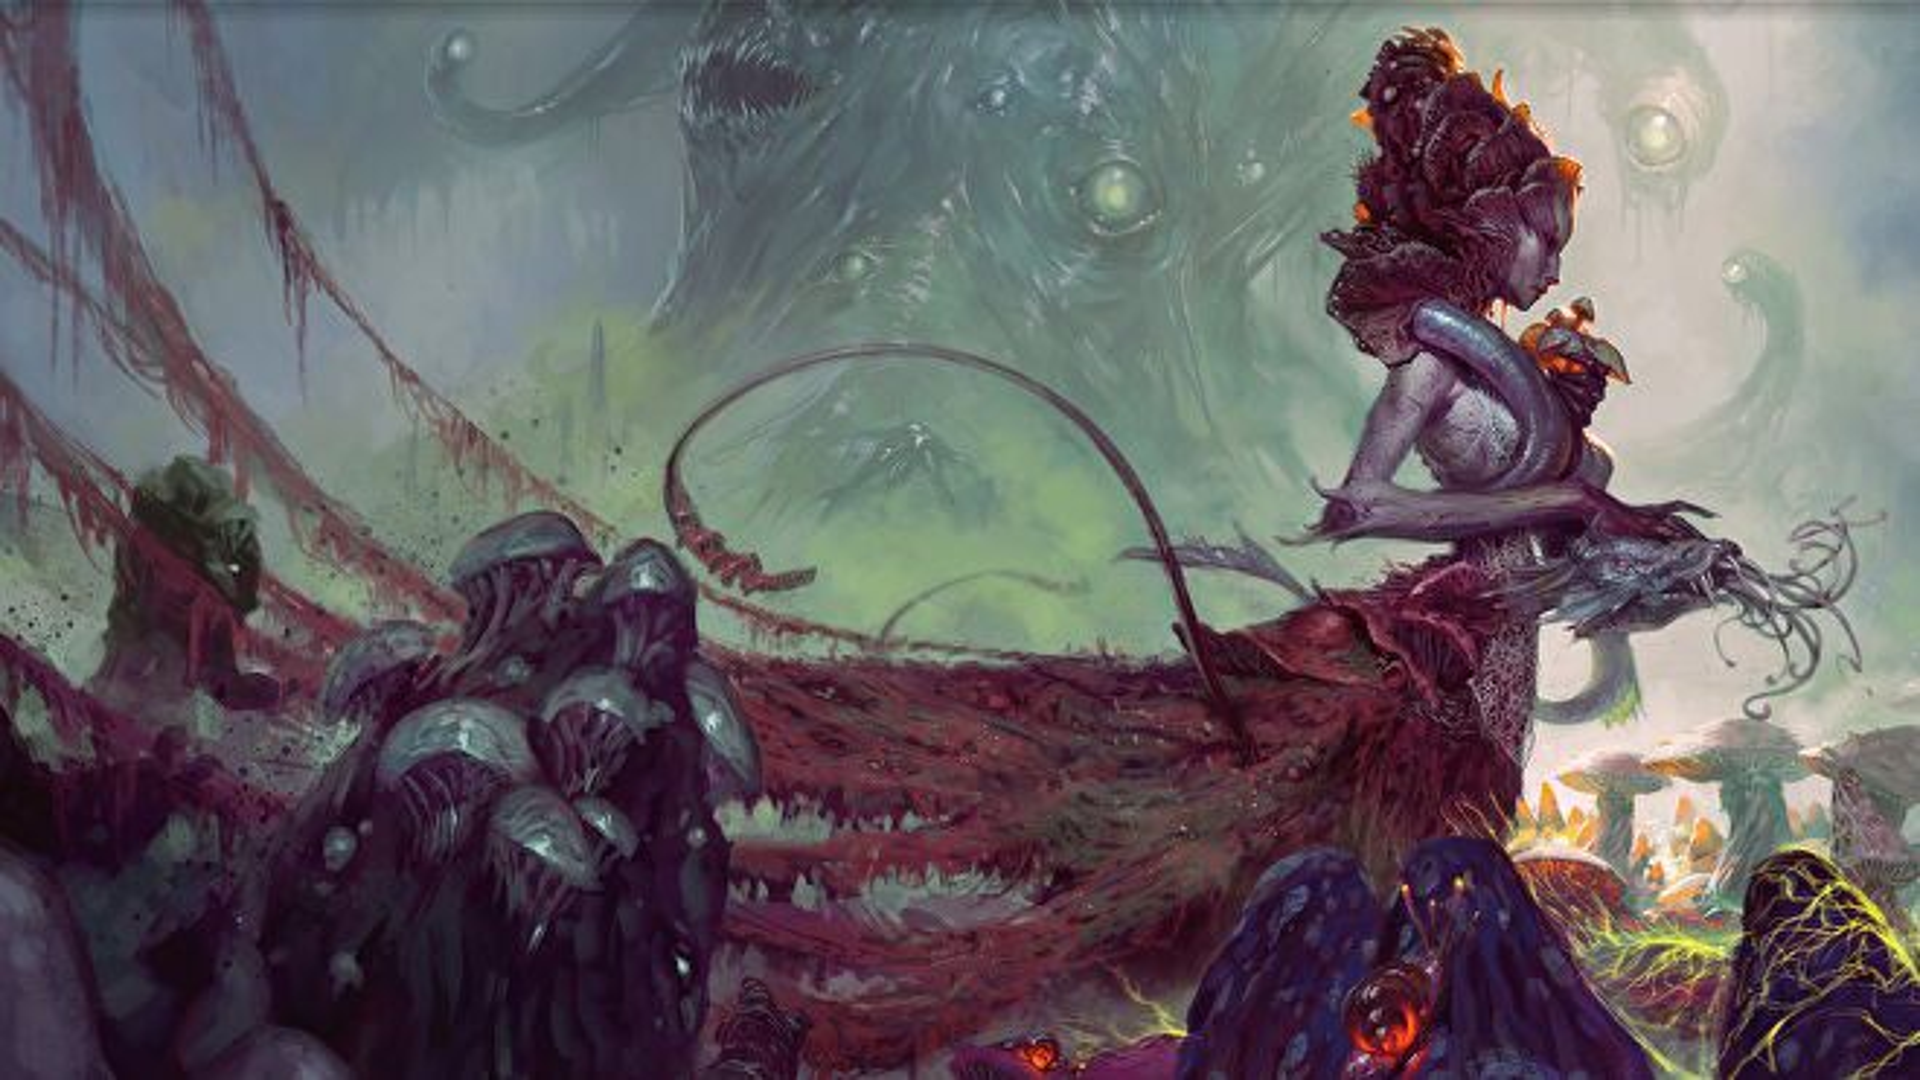 Dungeons & Dragons roleplaying game artwork 20